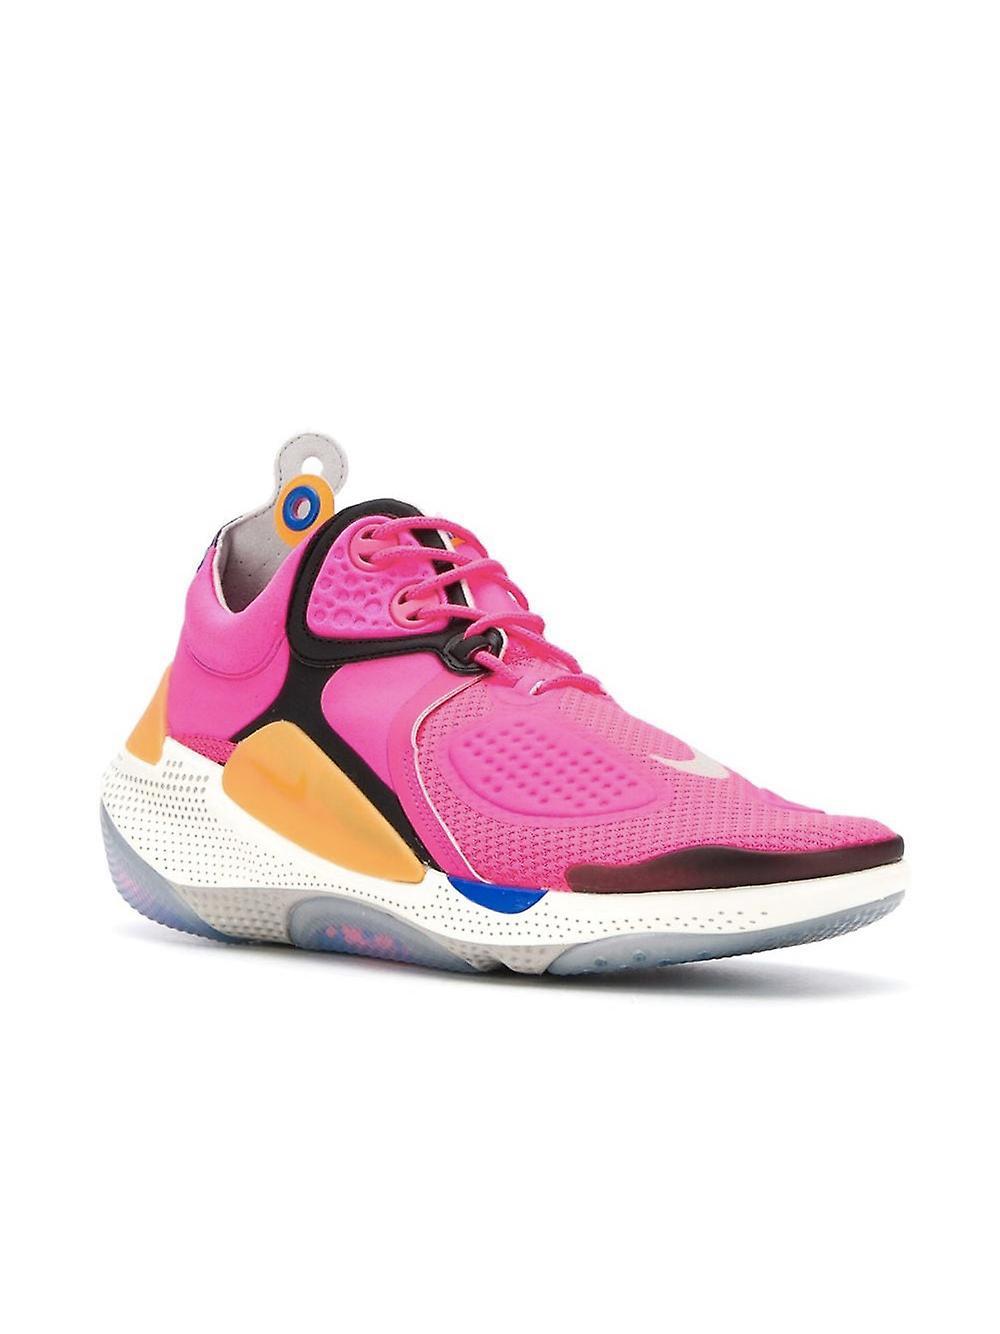 Nike Ezcr004059 Baskets en tissu rose